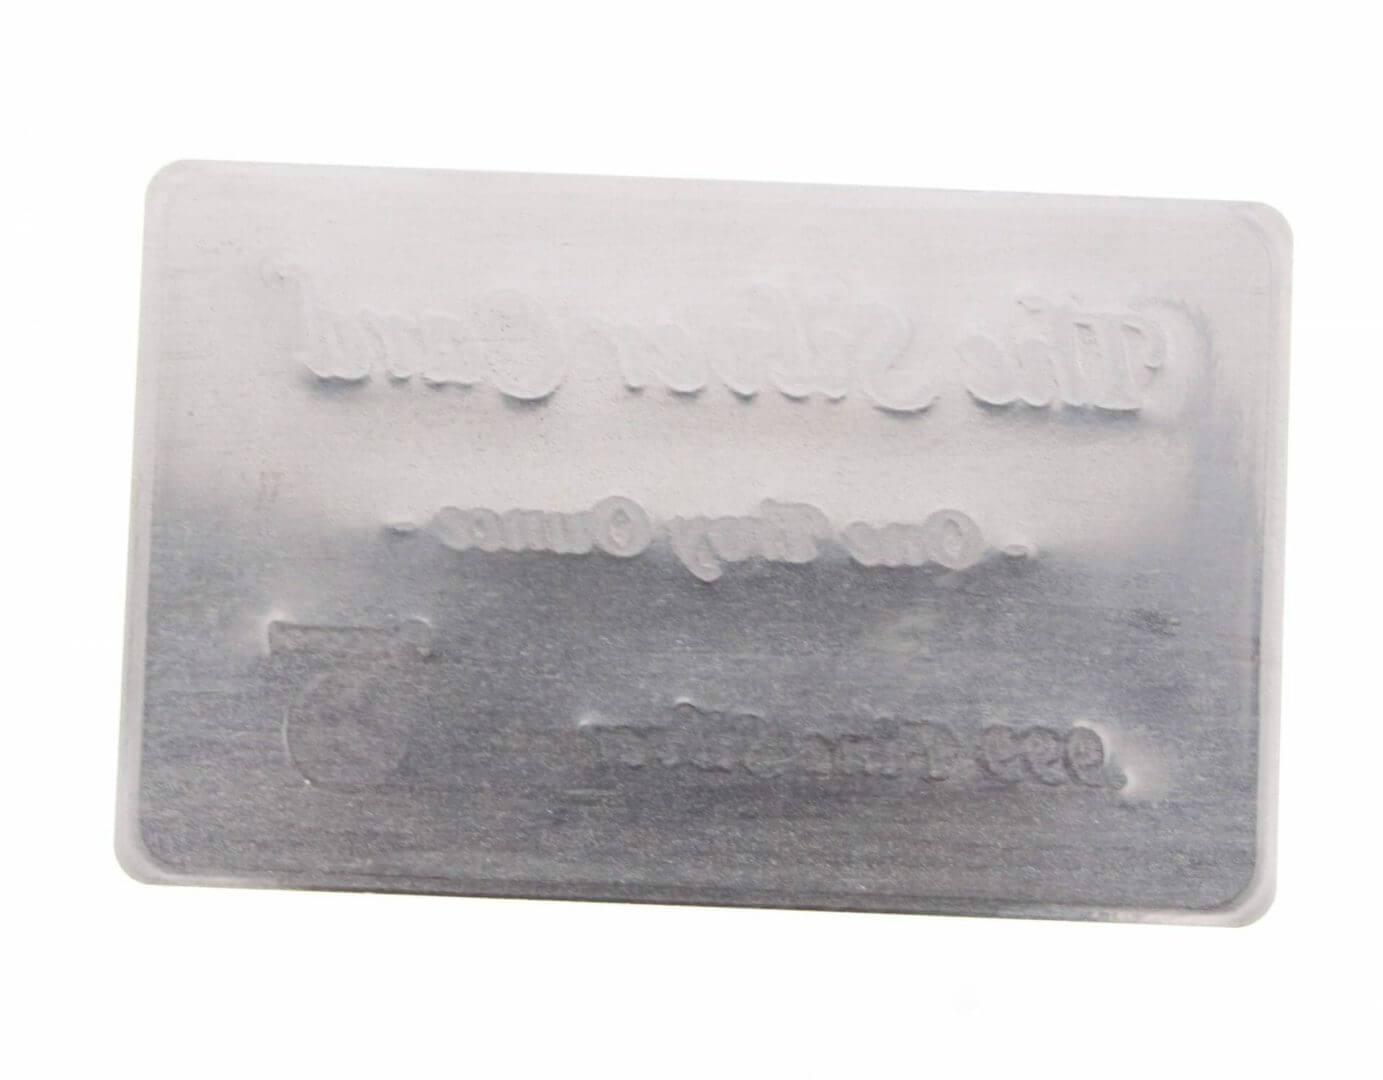 Pyromet 1oz .999 The Silver Card Bullion Bar 3